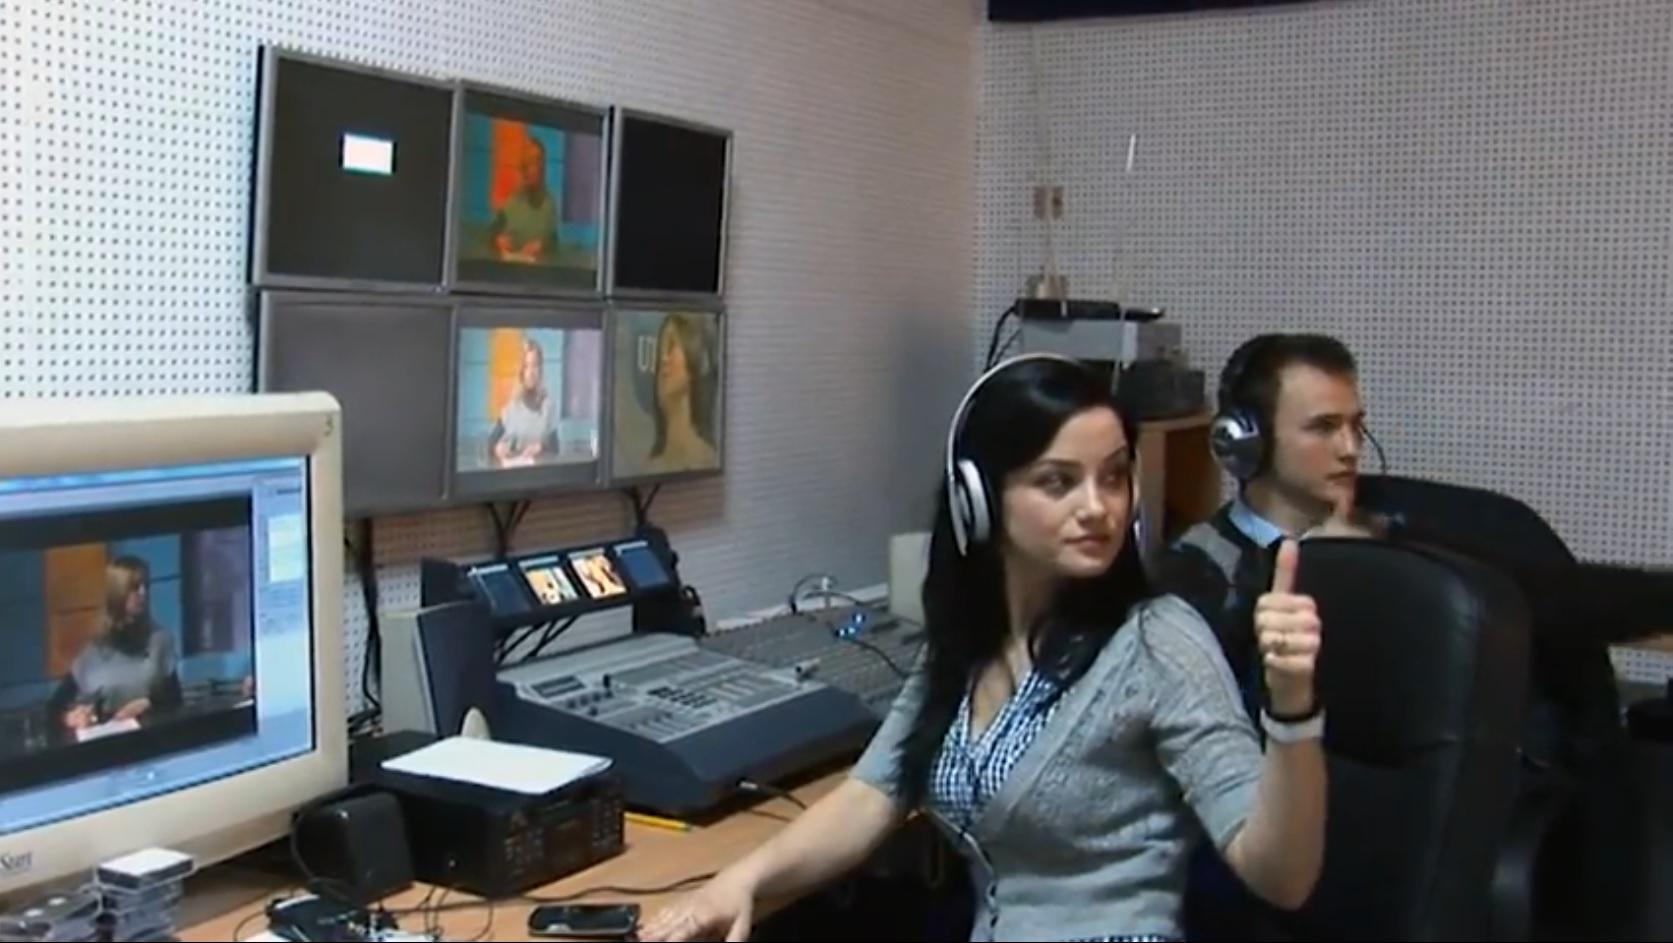 Jurnalism UBB TV Prezentare